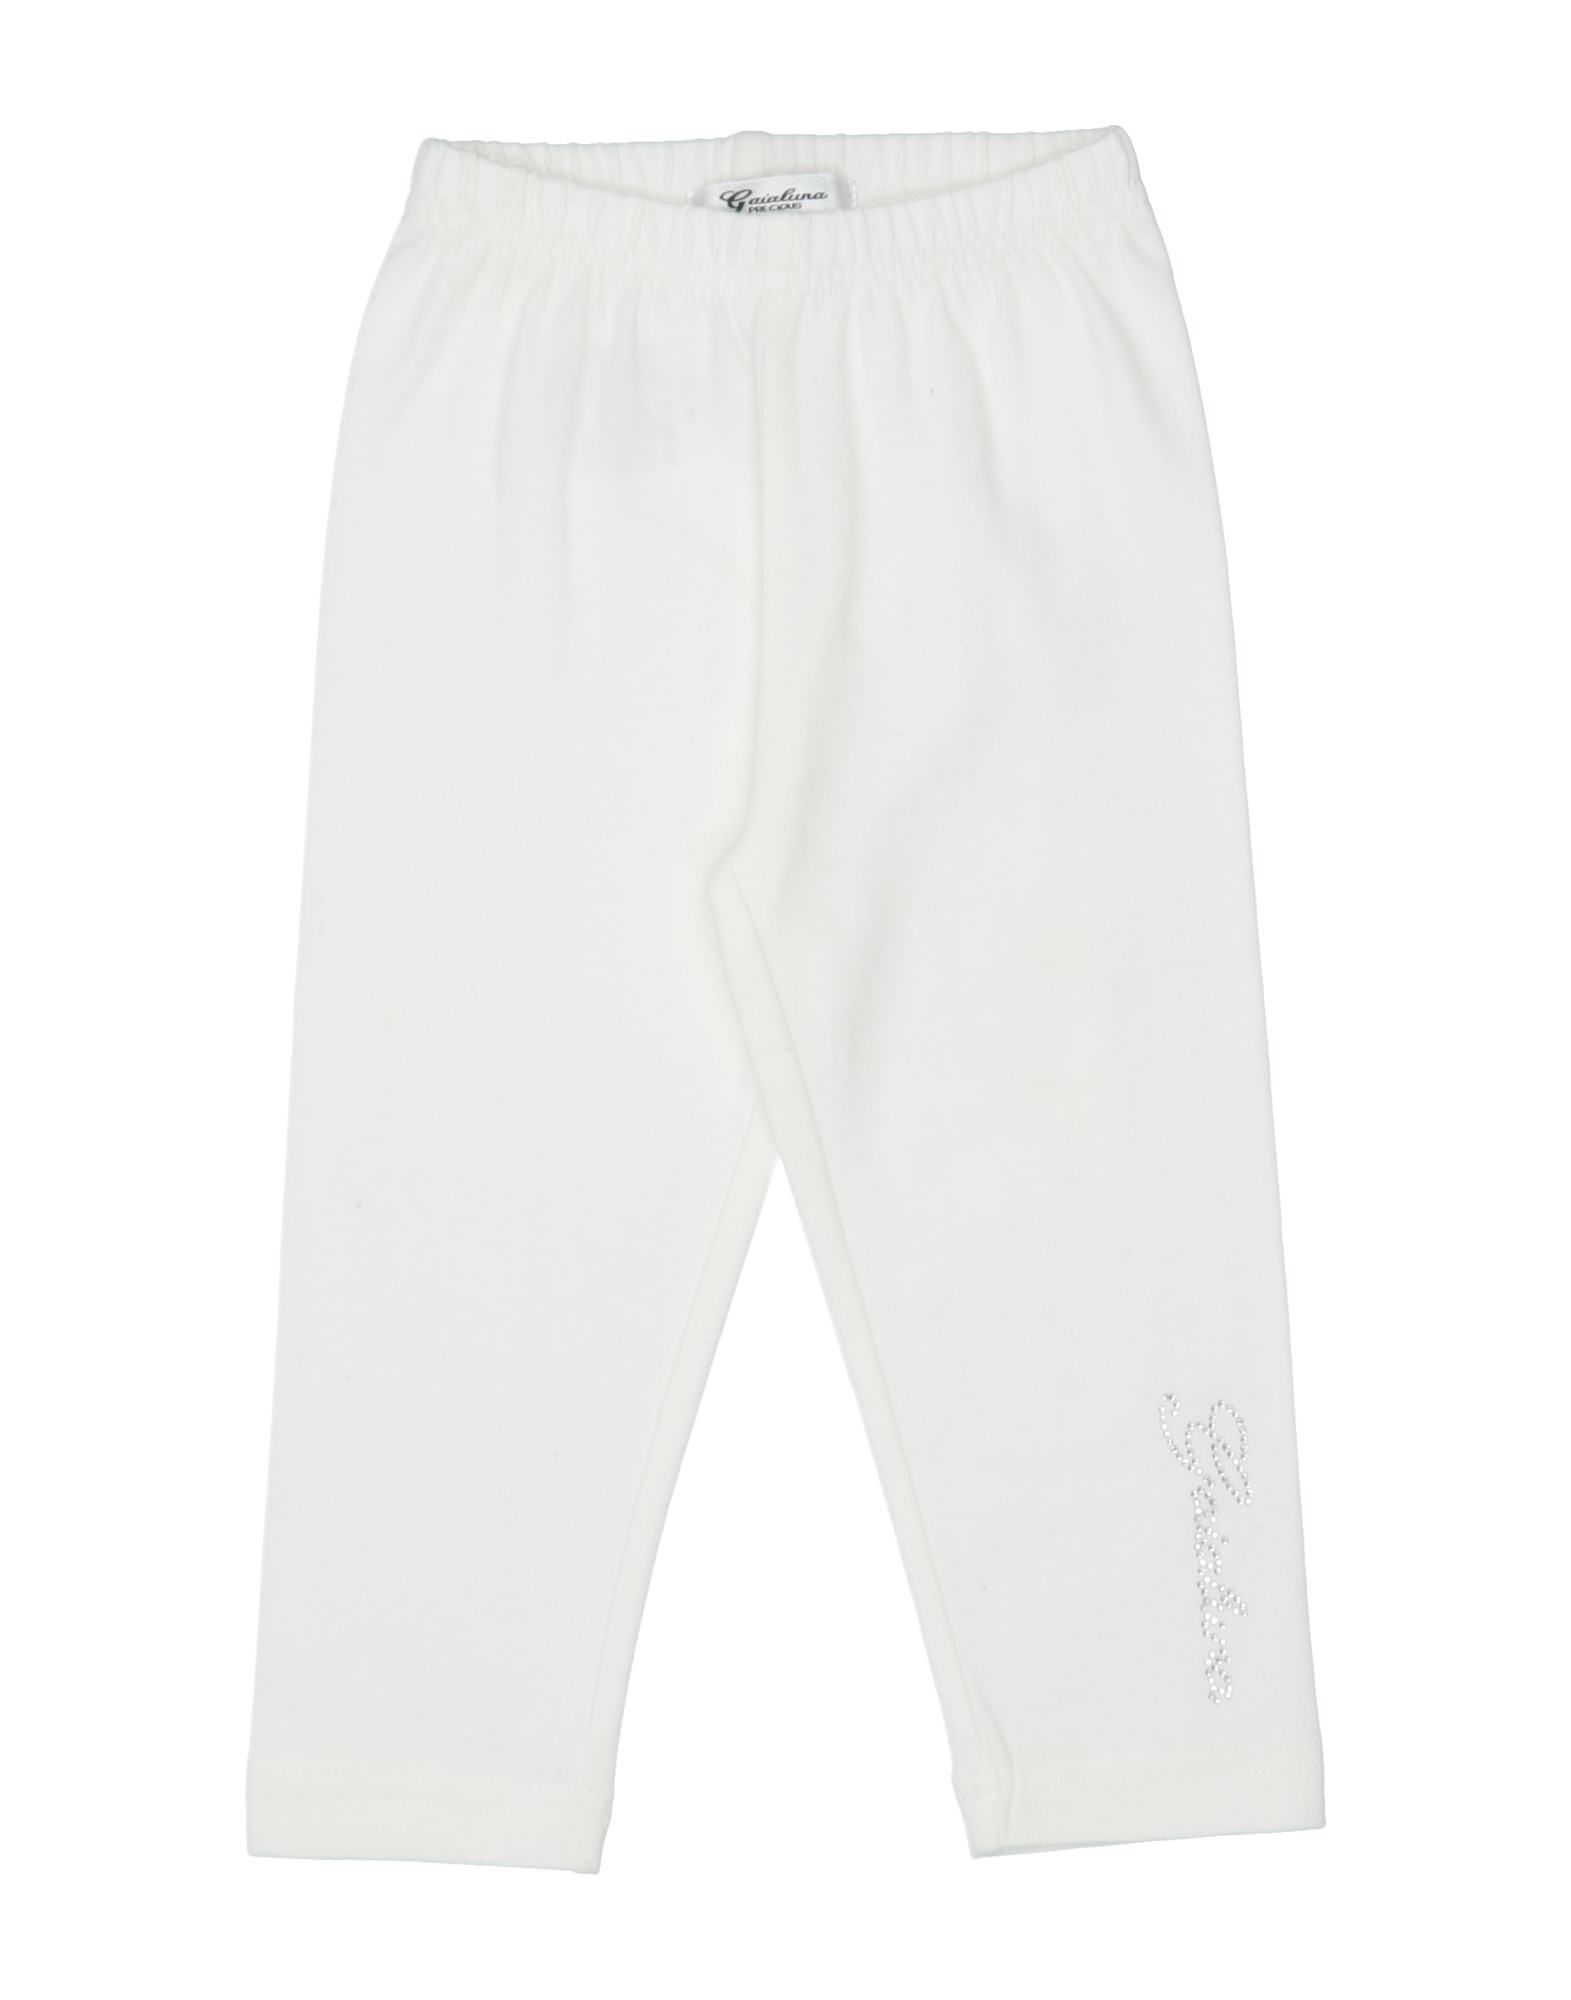 Gaialuna Kids' Leggings In White